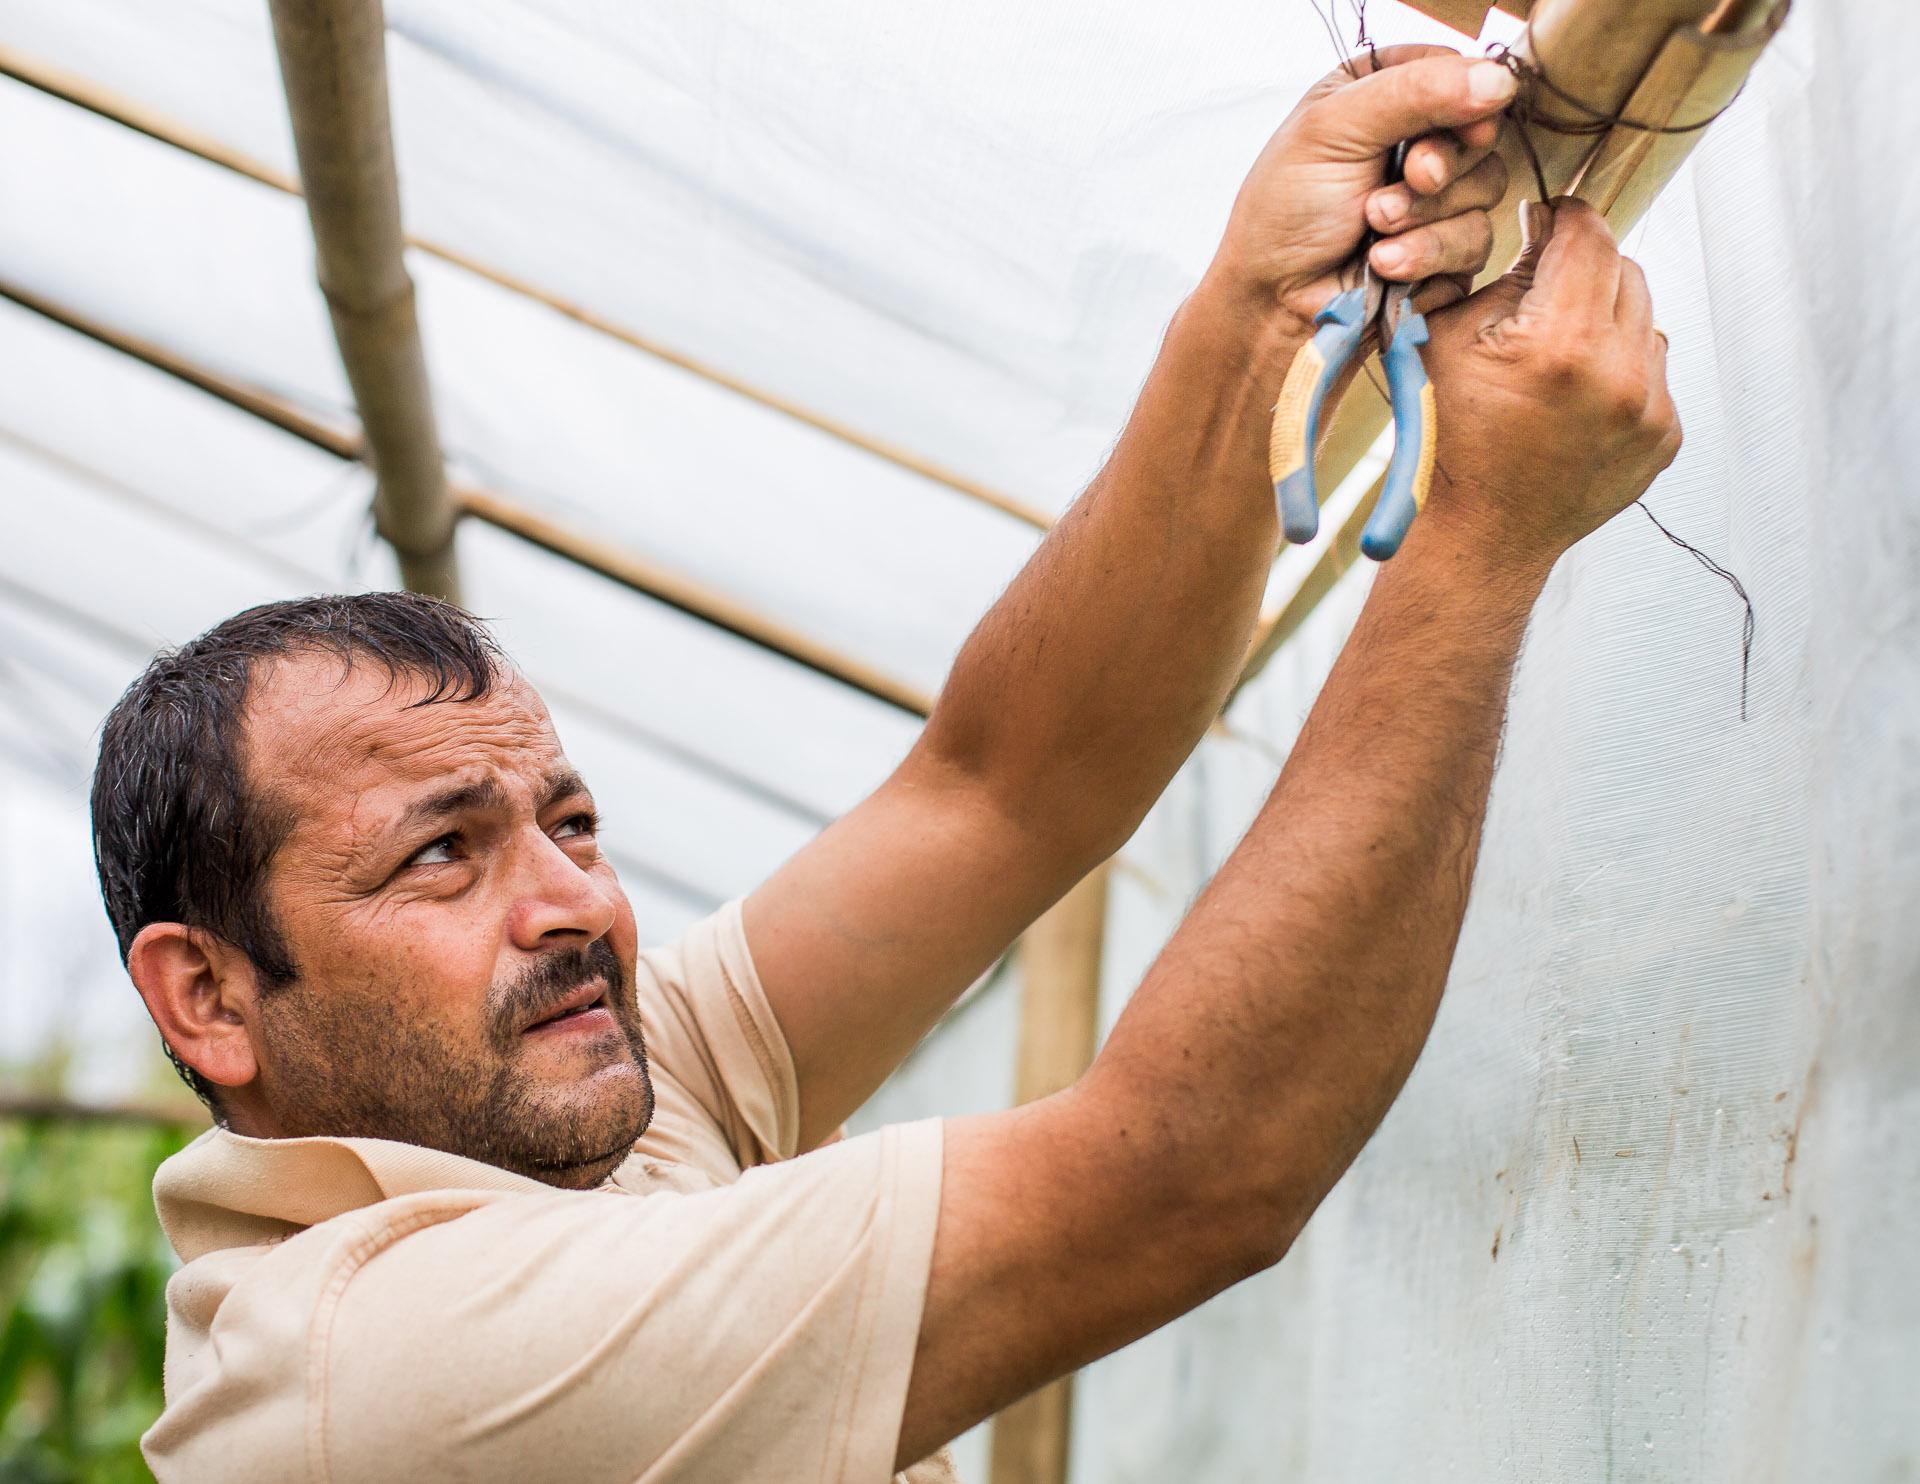 Domaraj tying bamboo together.